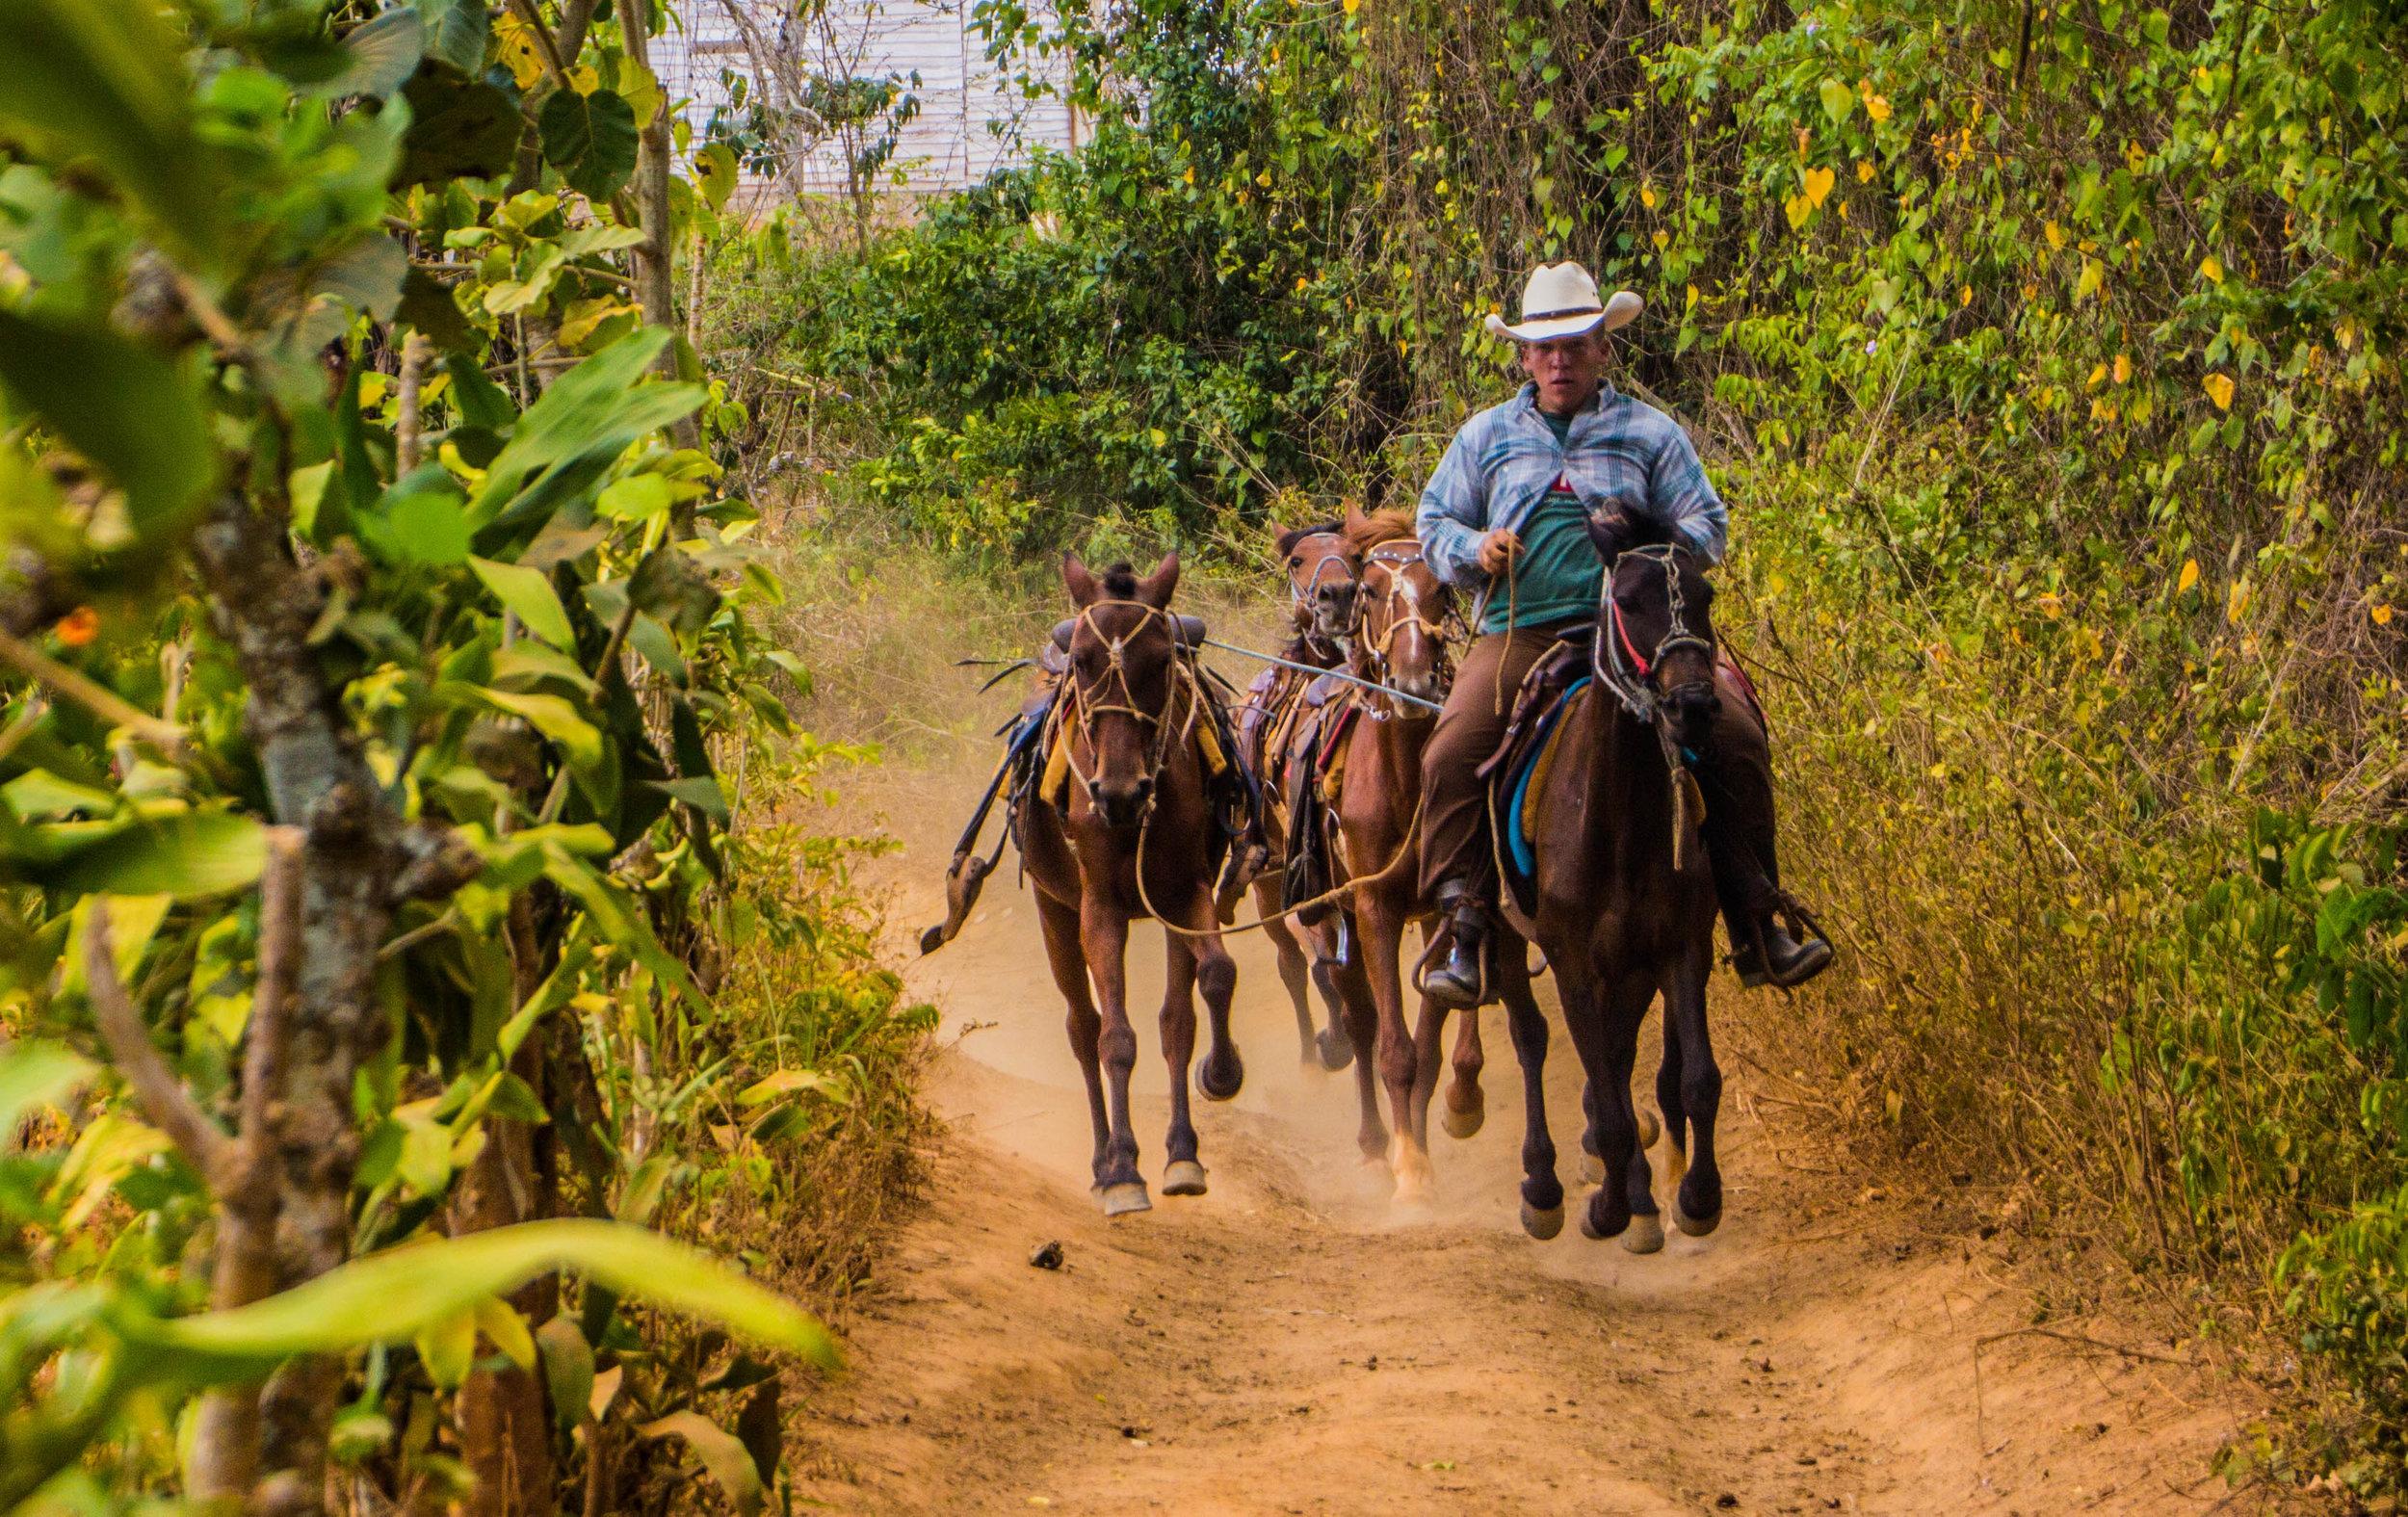 horses valle de viñales cuba -1-2-2.jpg